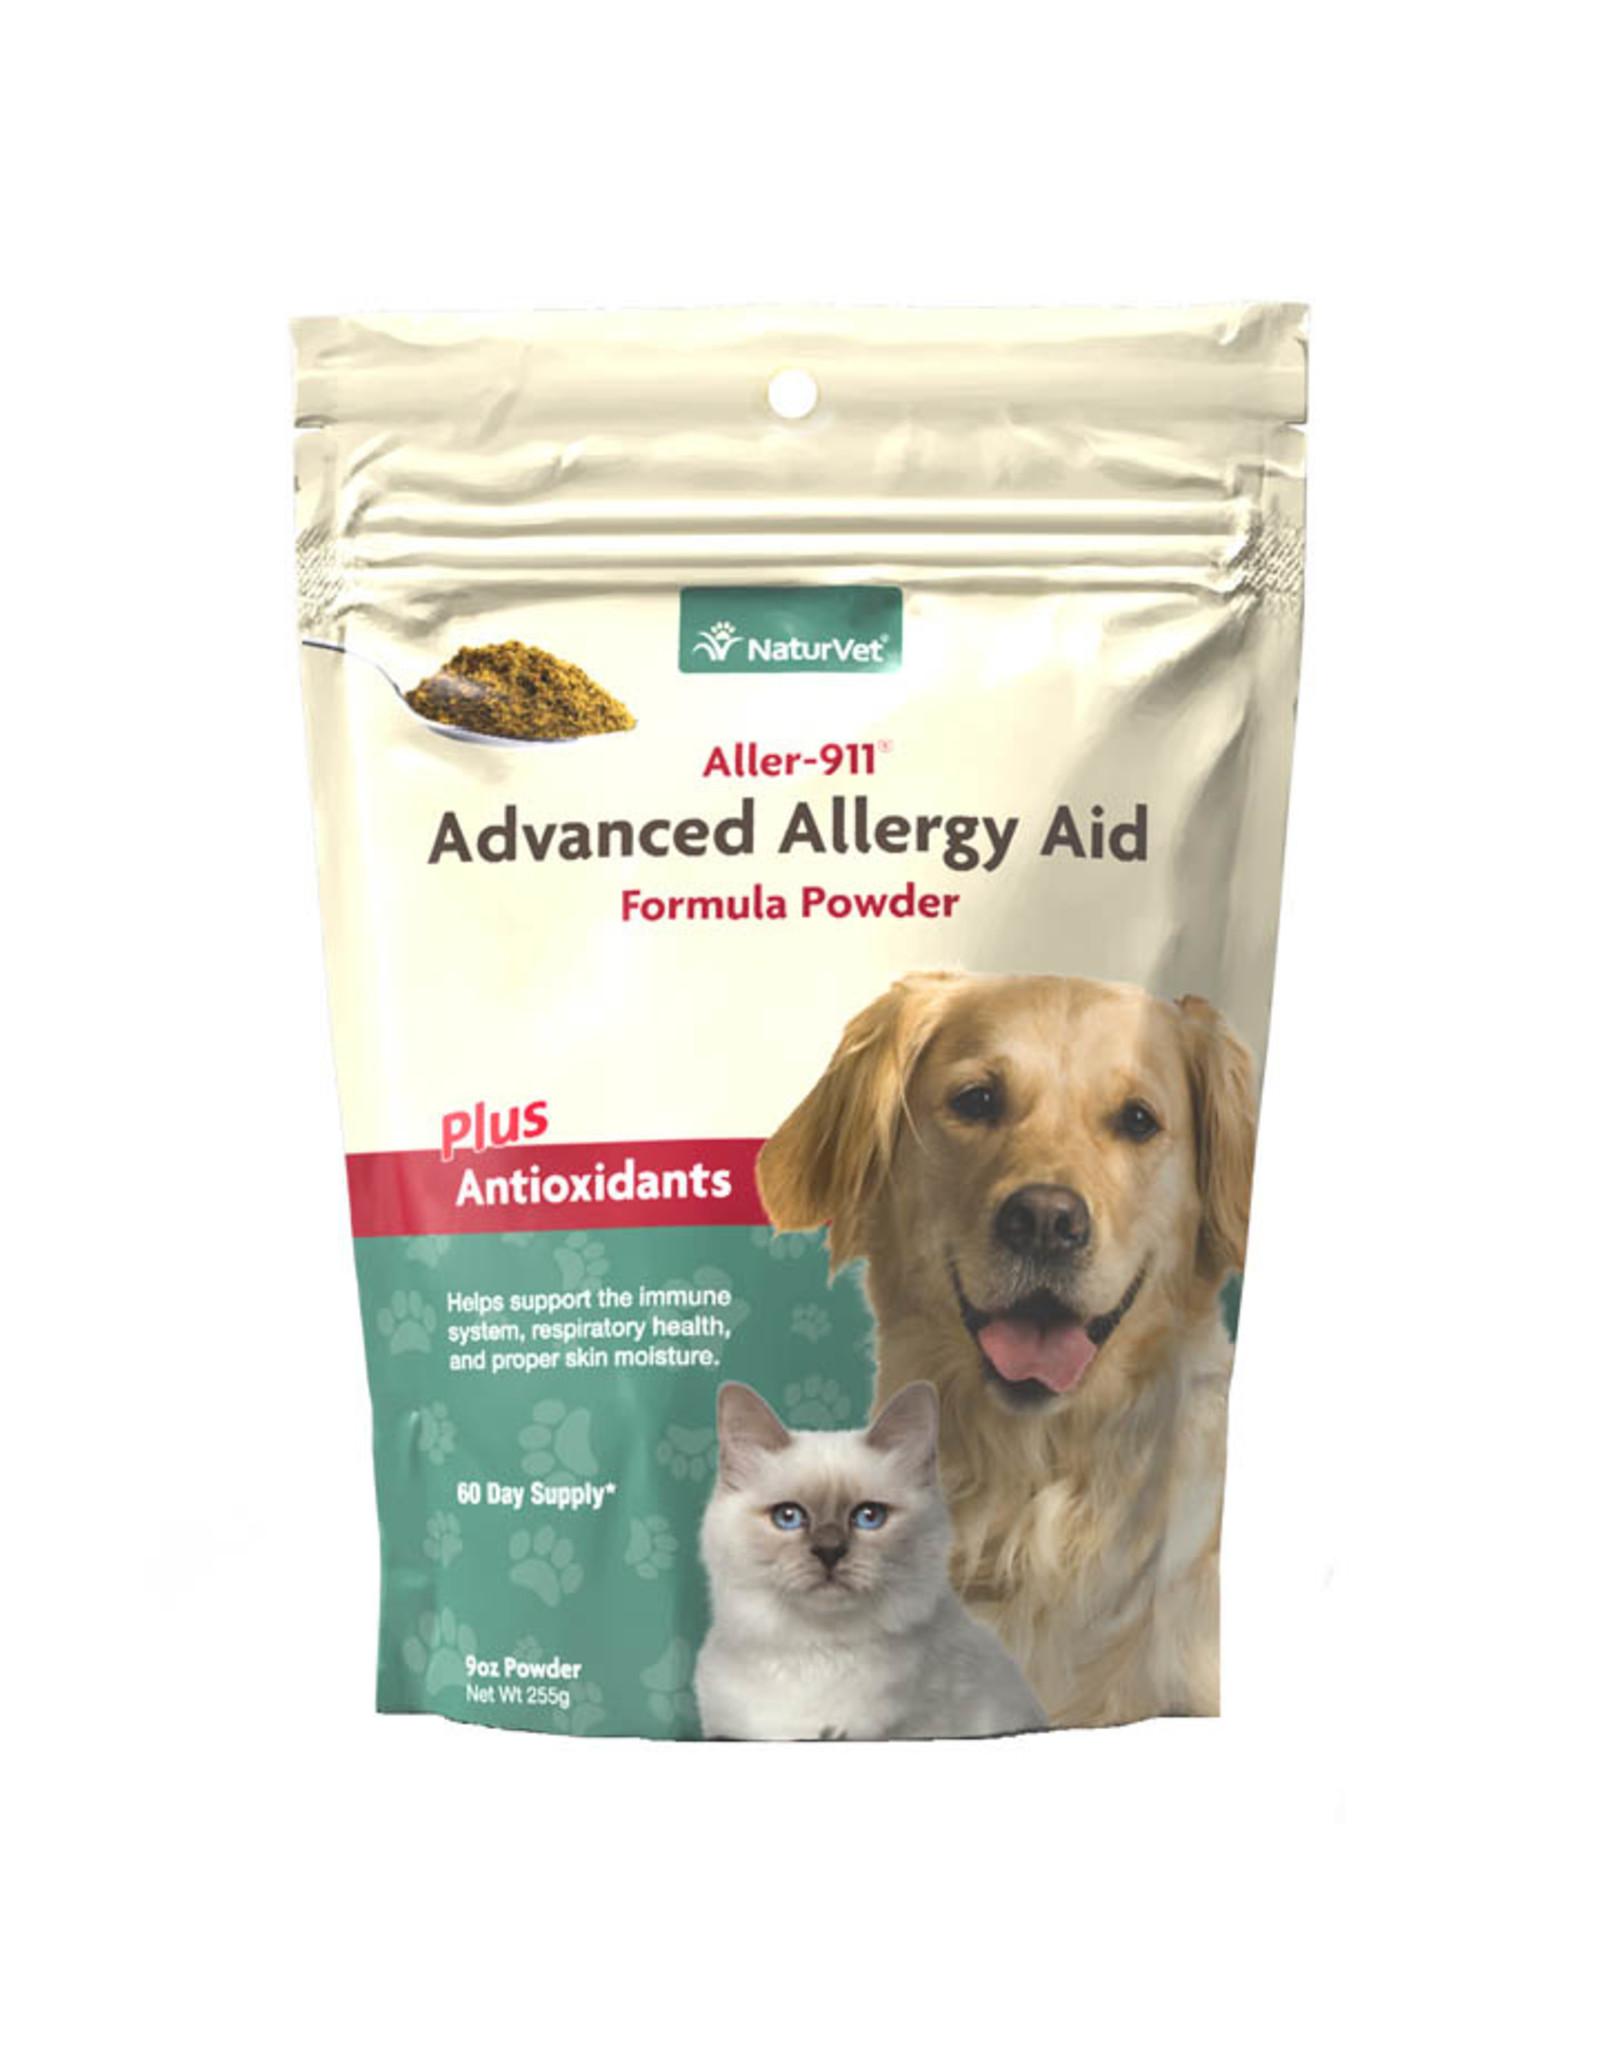 naturVet NaturVet Aller-911 Allergy Aid Skin and Coat plus Antioxidants Powder for Dogs and Cats 9oz